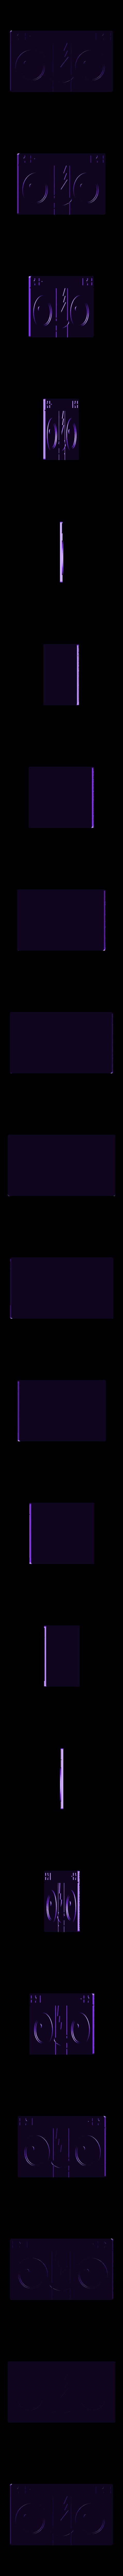 boomypi-face.stl Download free STL file Raspberry Pi Airplay BoomBox • 3D printer template, Adafruit